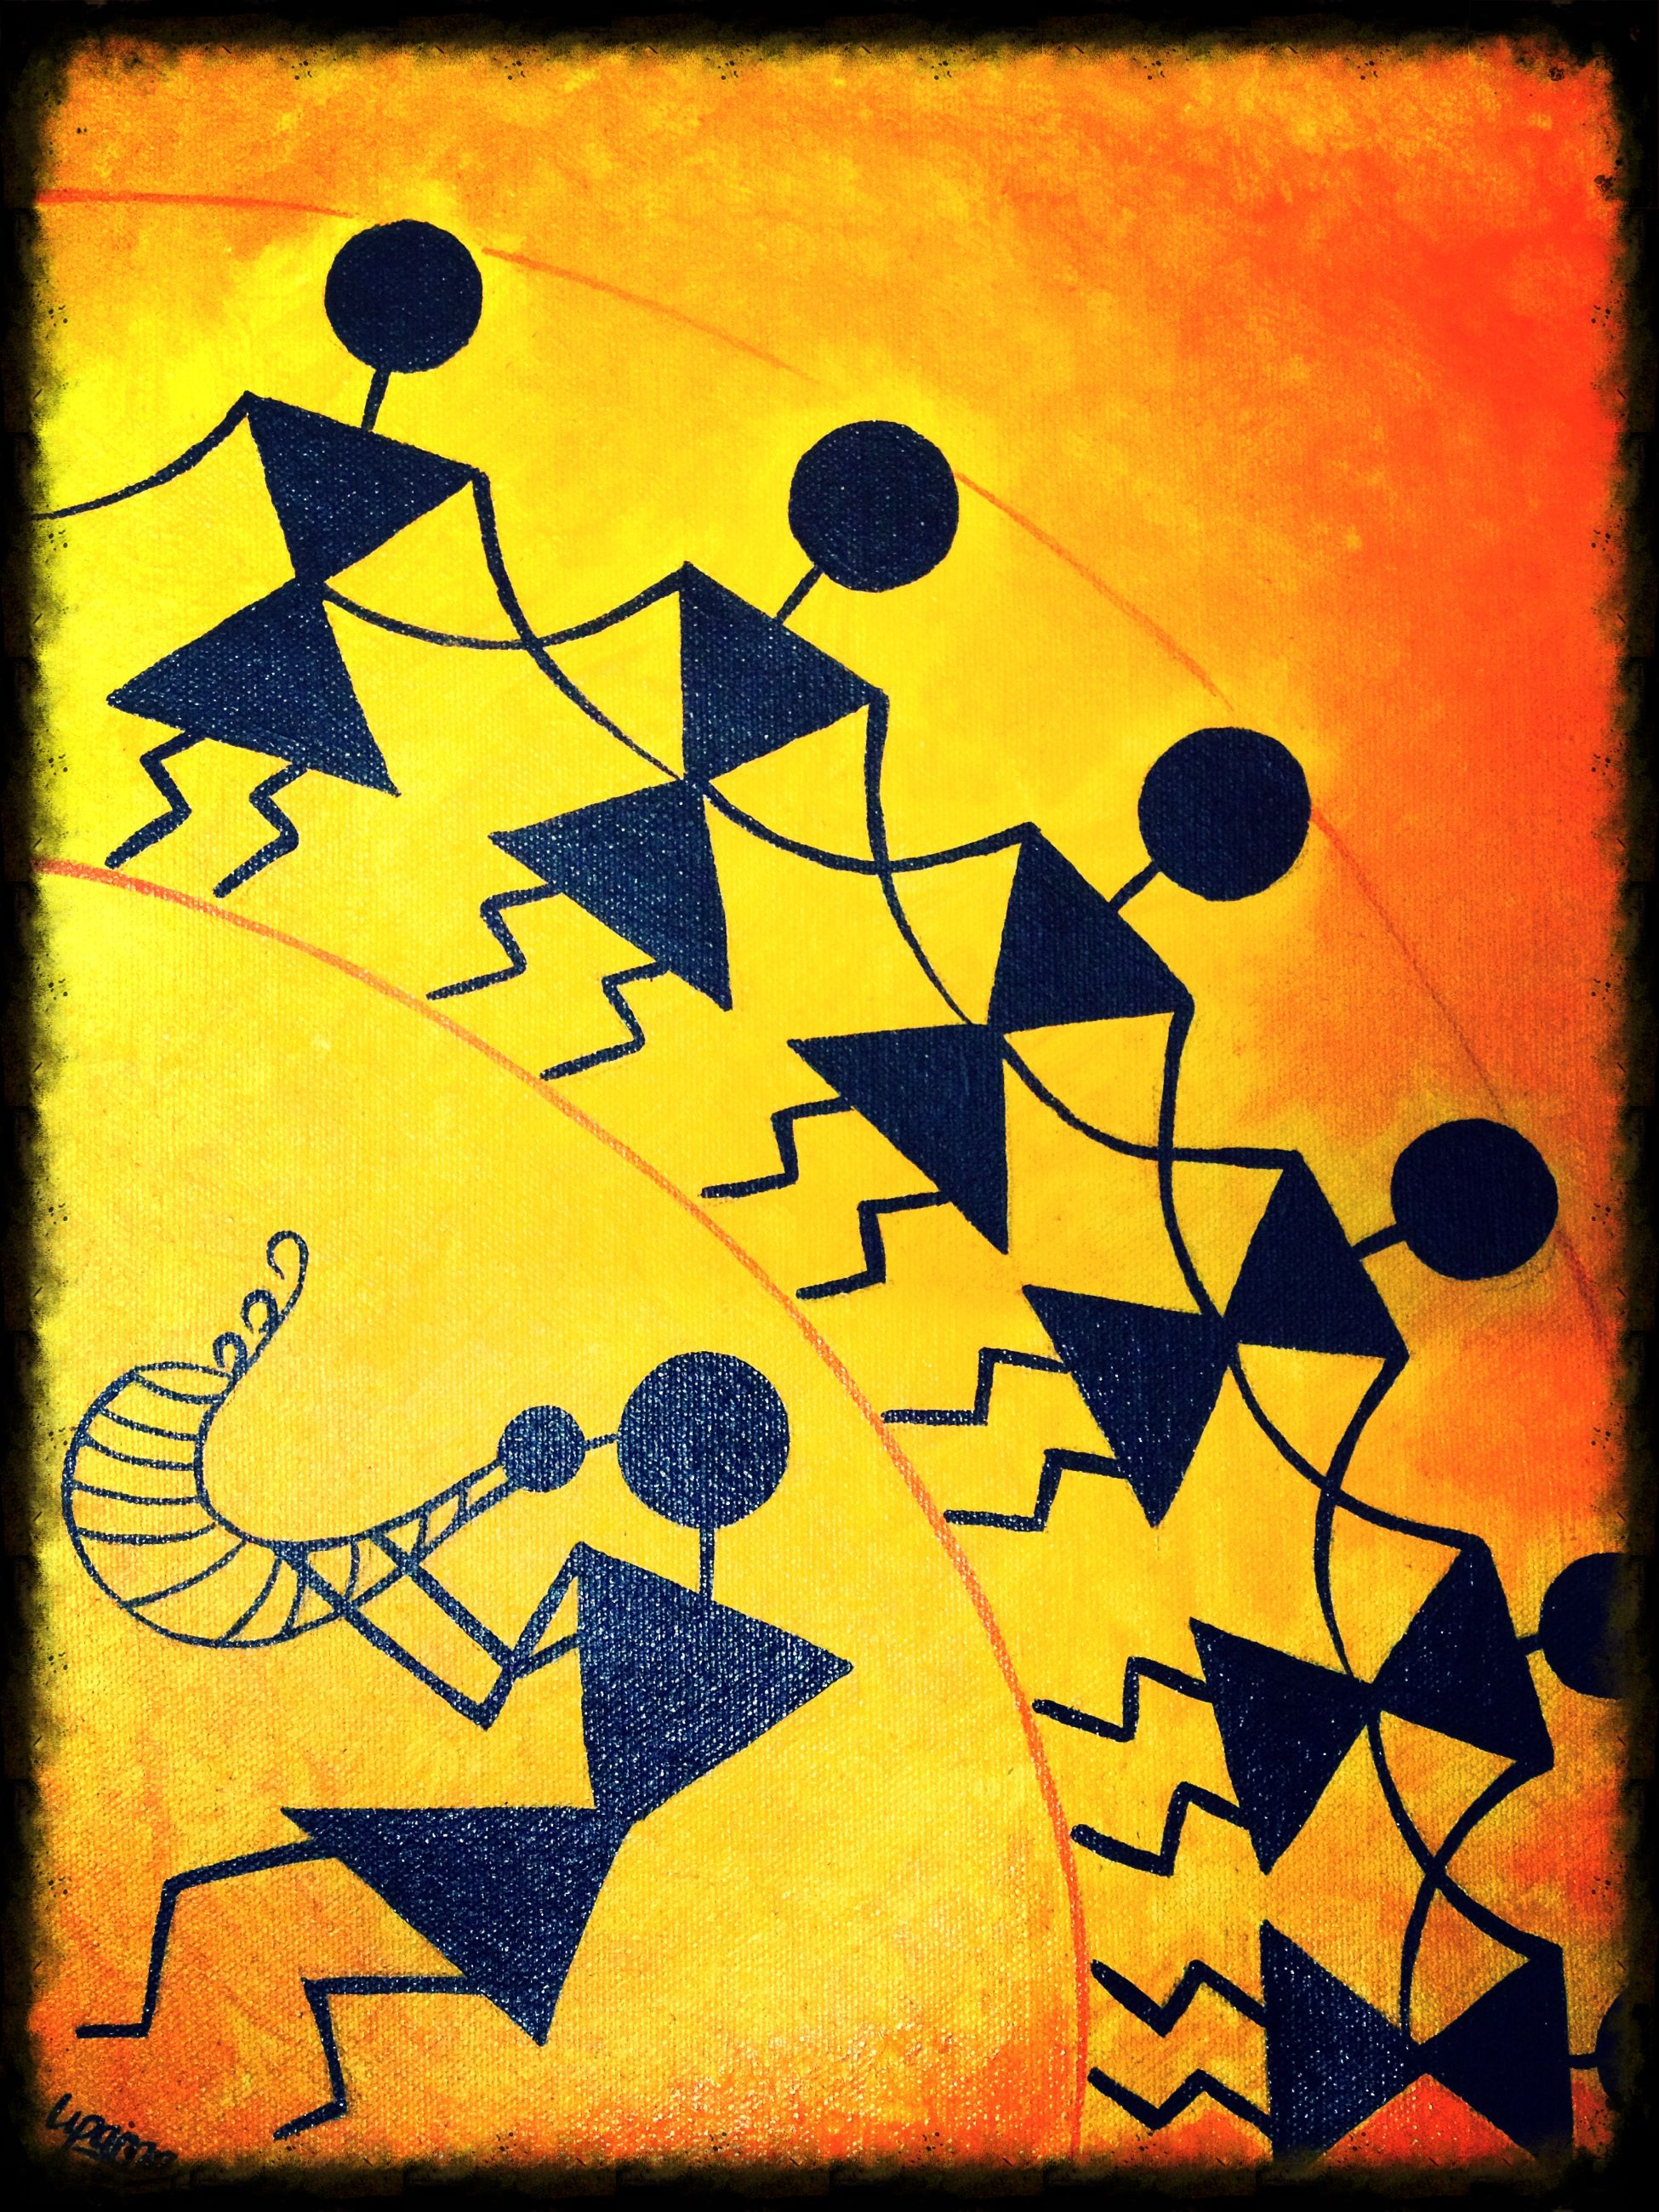 Warli dancers | K a l a speaks | Pinterest | Dancers, Paintings and ...